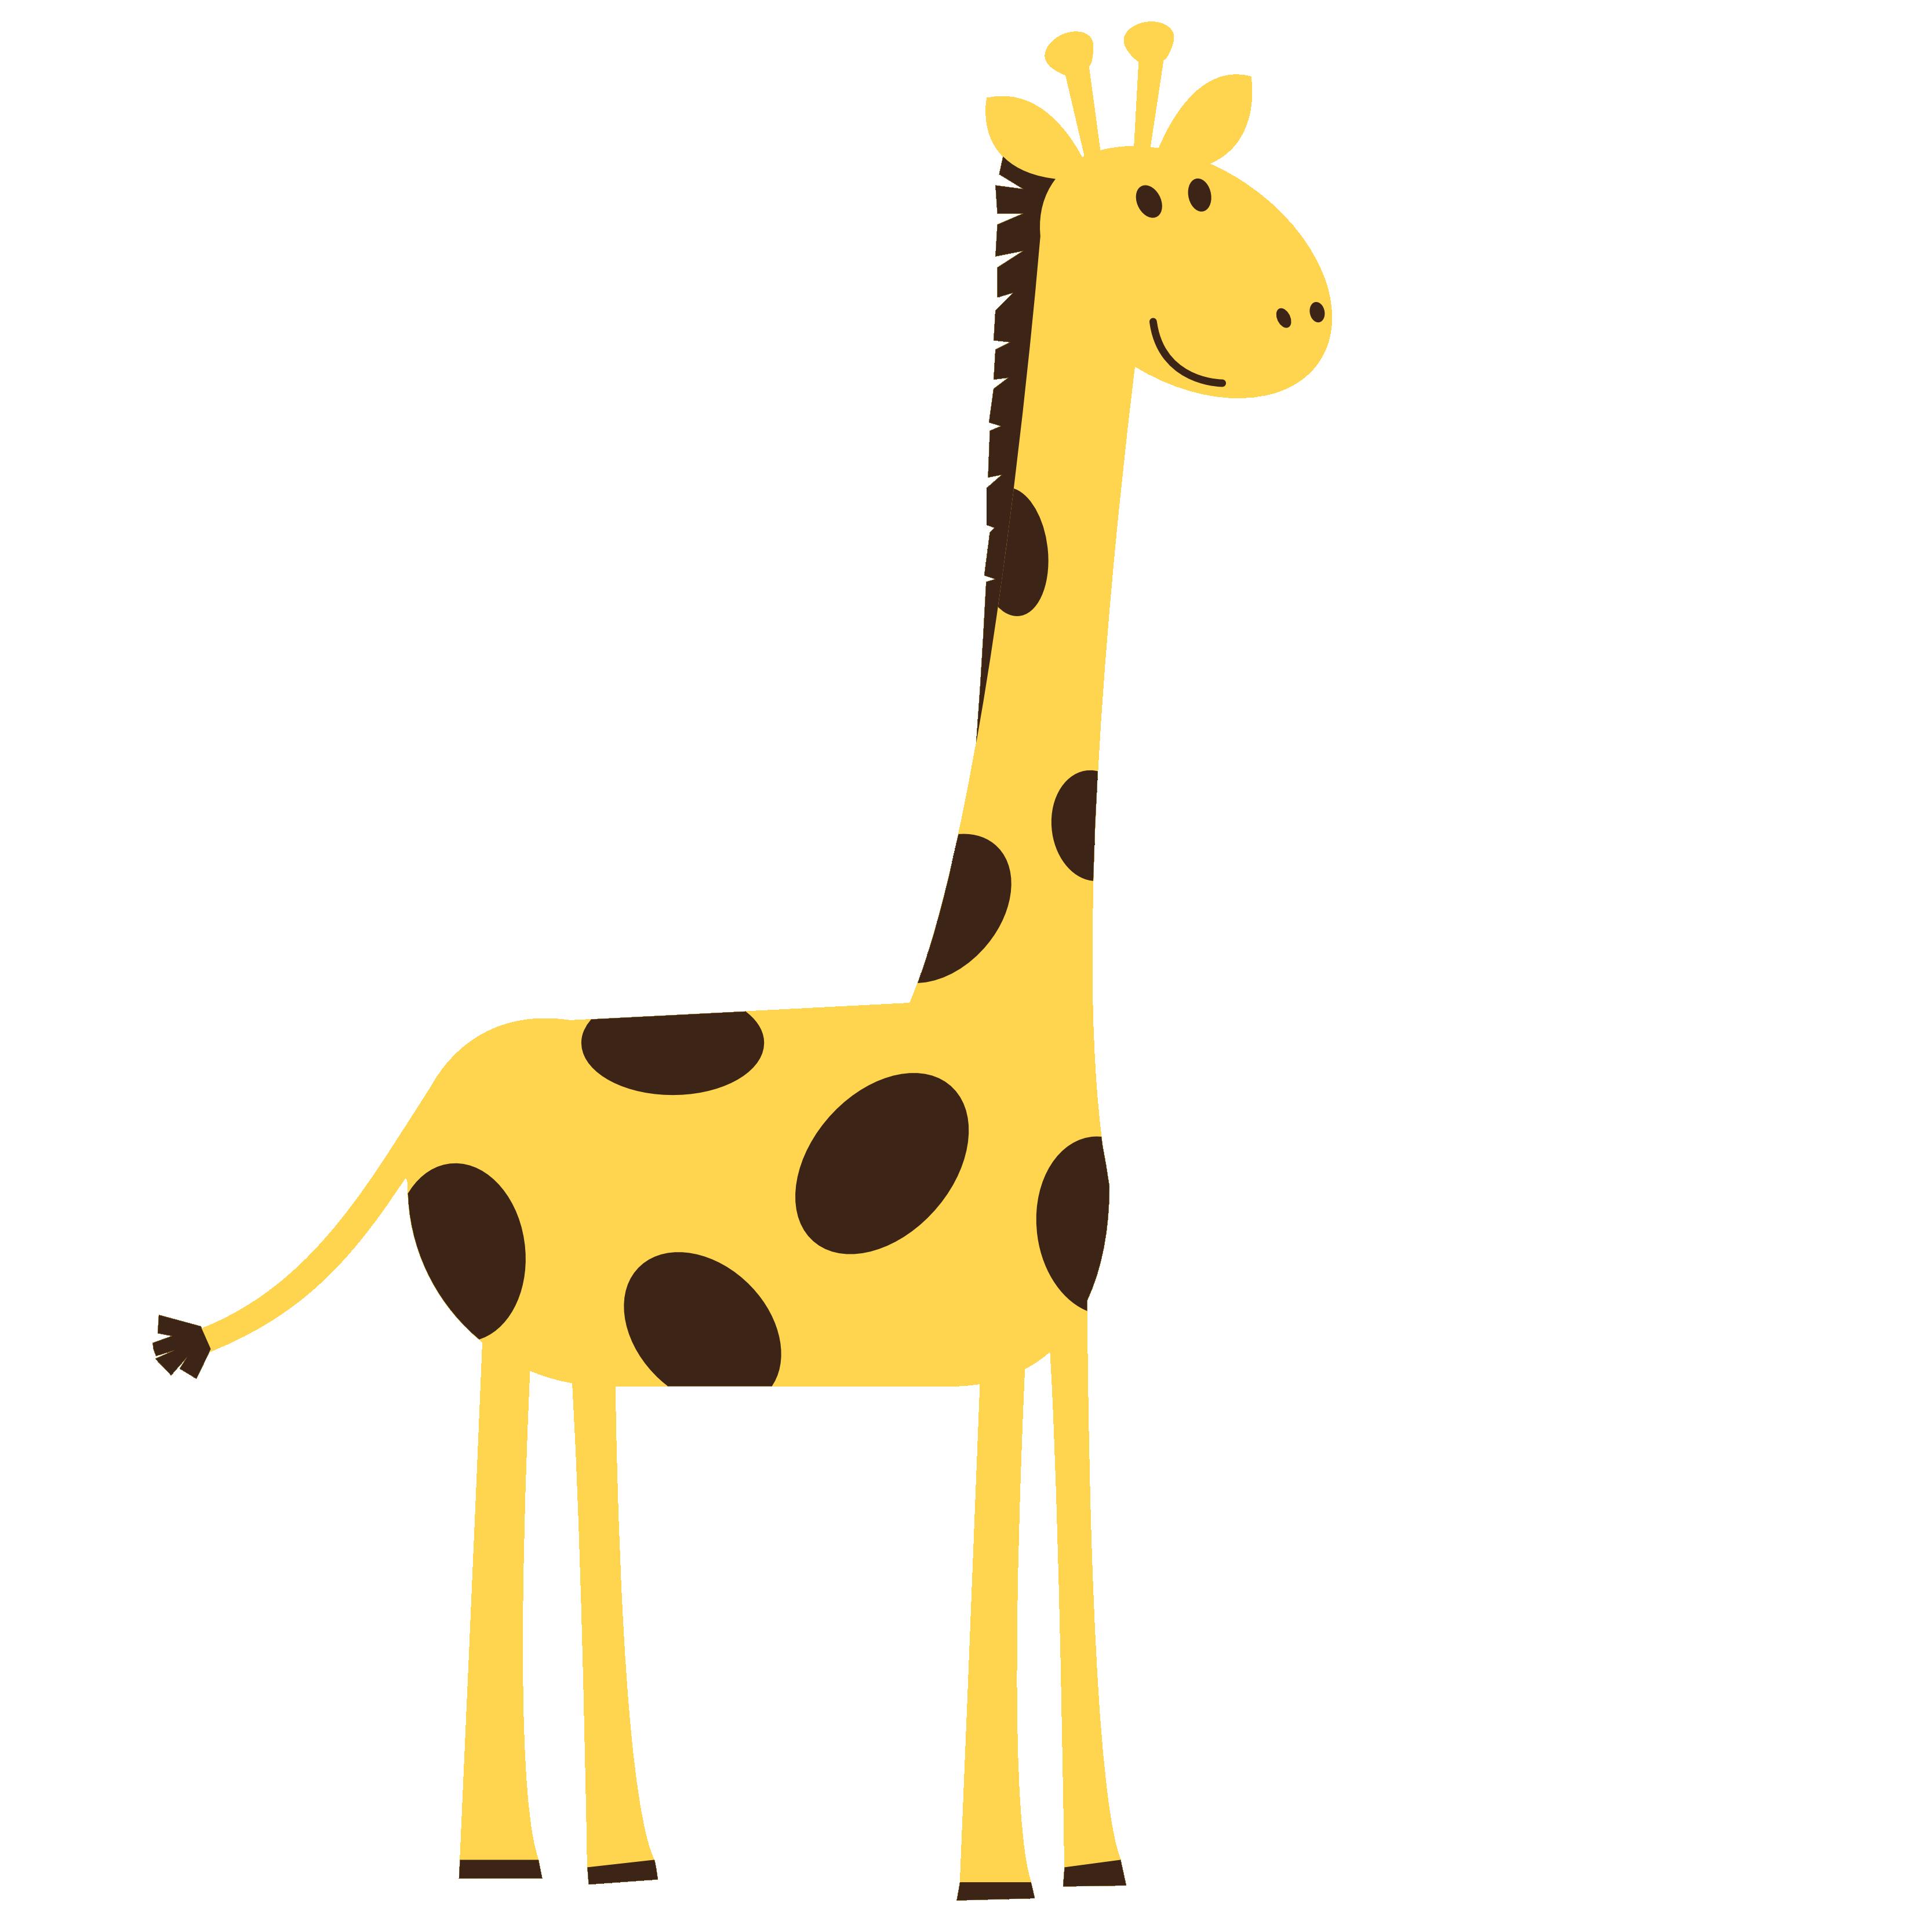 Giraffe image clipart image transparent download Free Giraffe Cliparts, Download Free Clip Art, Free Clip Art on ... image transparent download